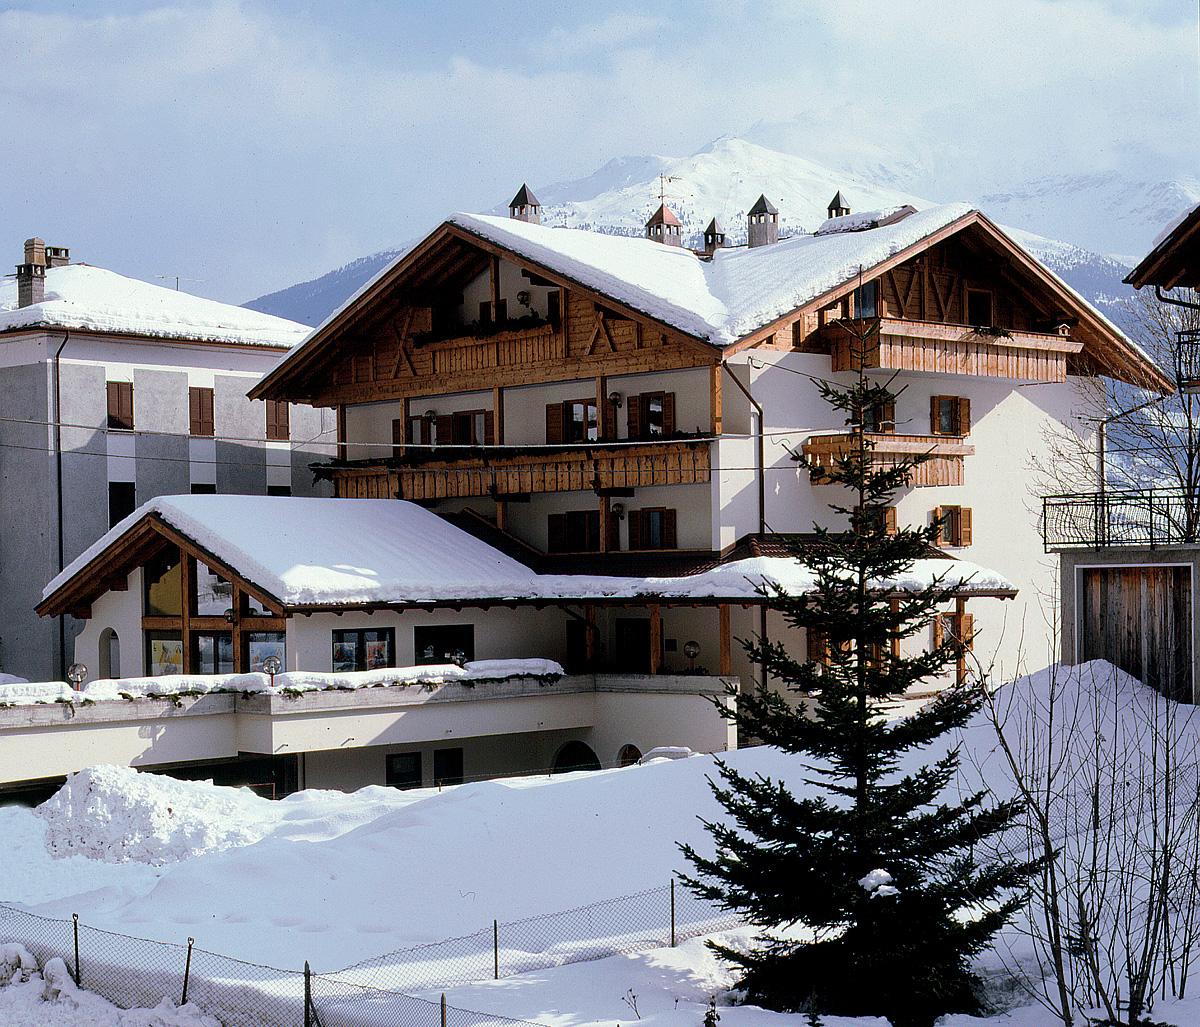 Itálie (Alta Valtellina) - Residence Erika